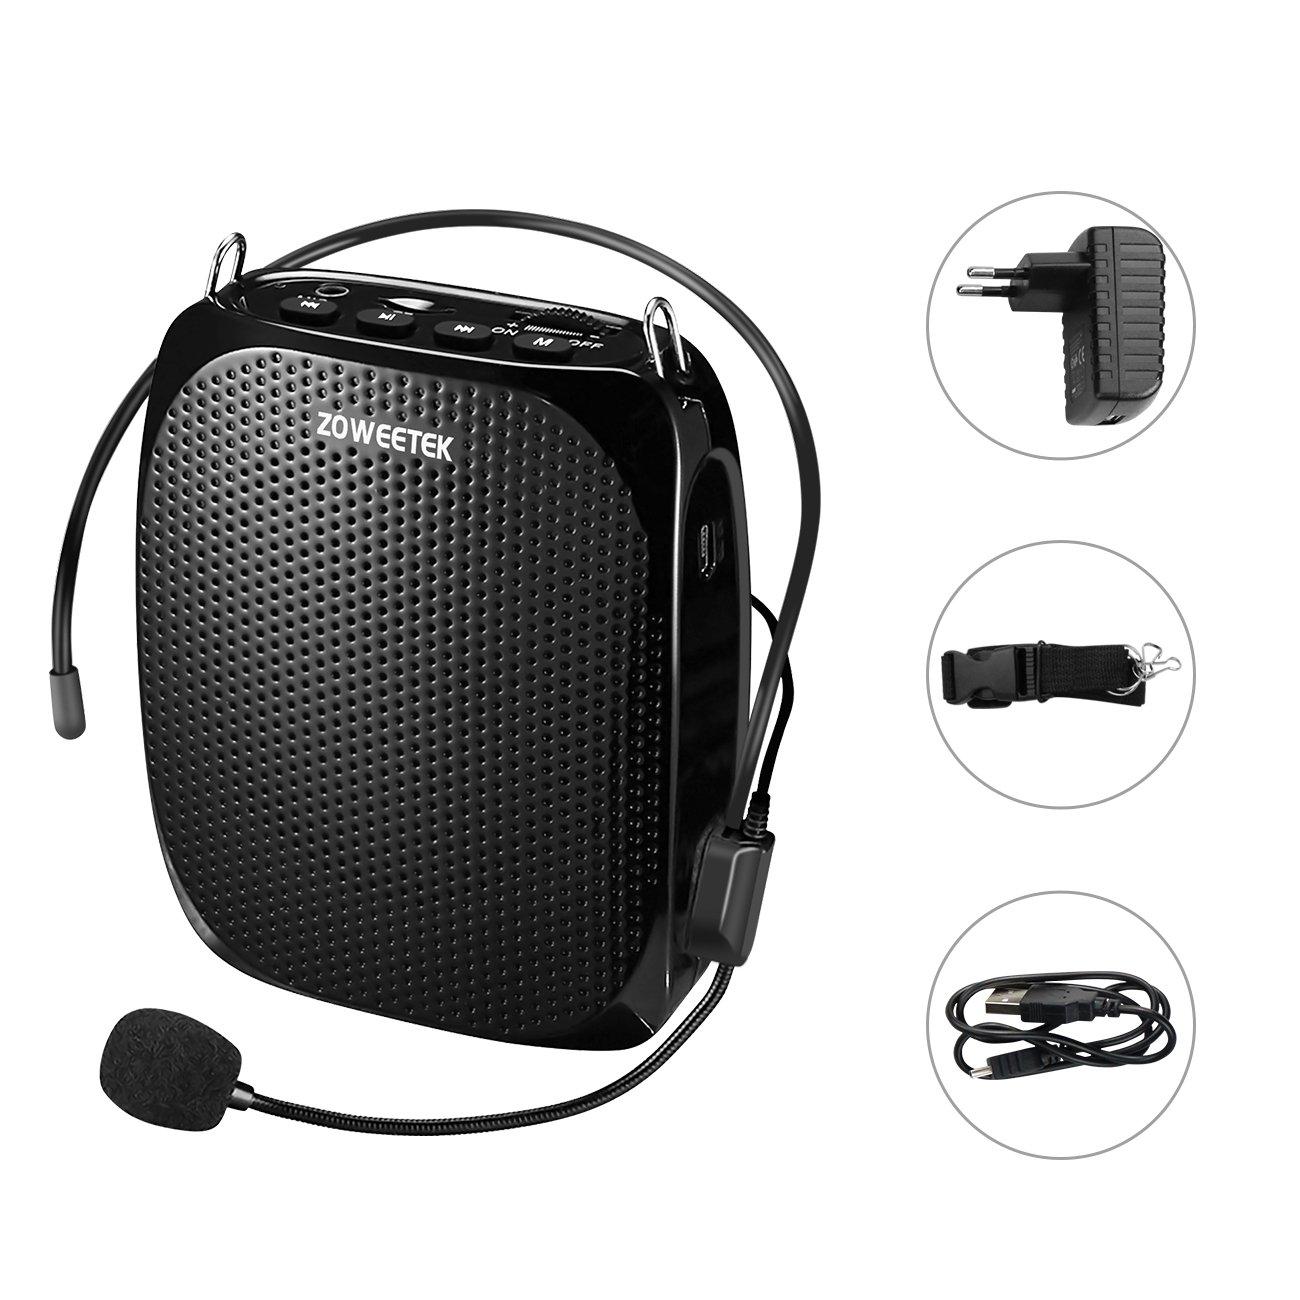 Zoweetek® Amplificador portatil W con mAh batería de litio con un microfono